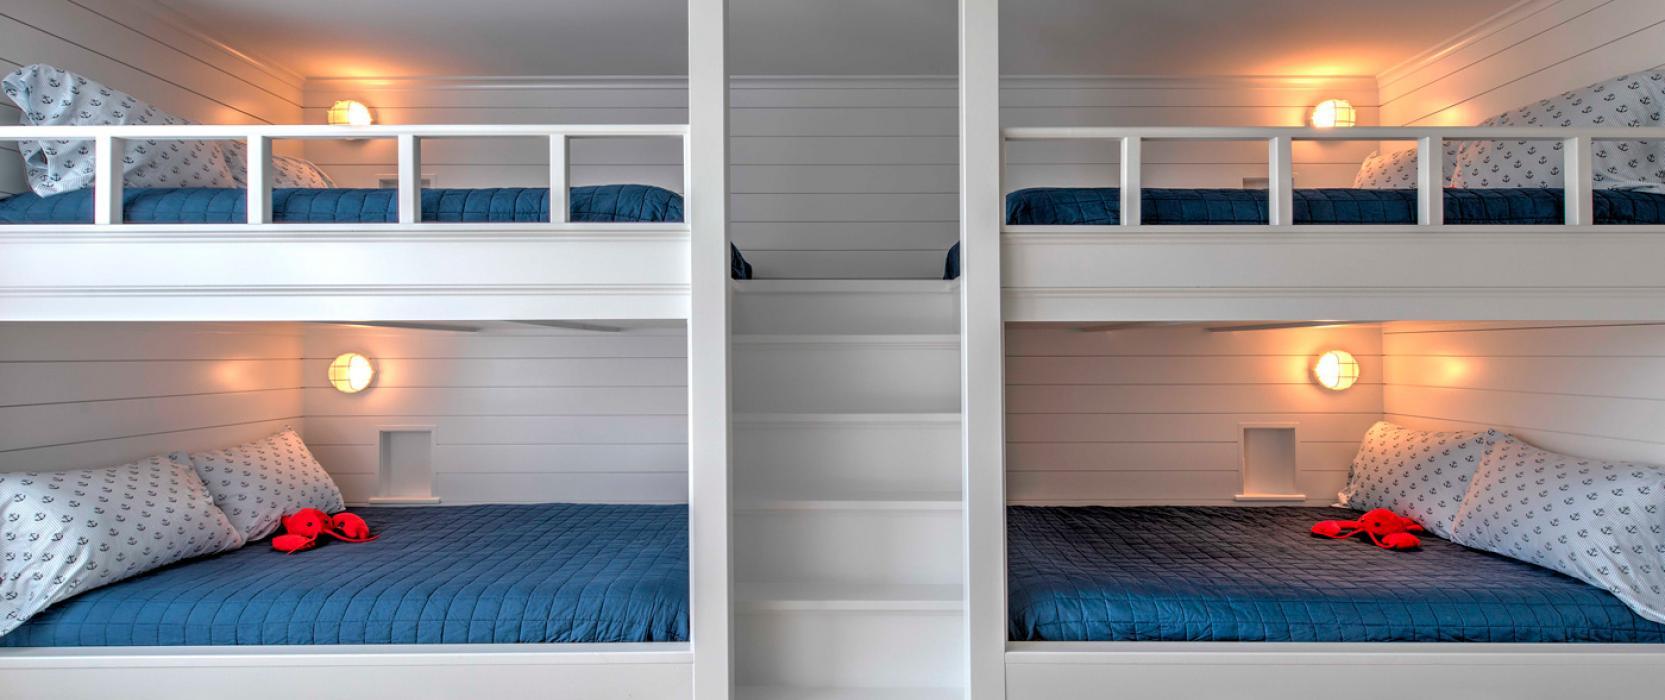 custom-designed built-in full-size bunk beds